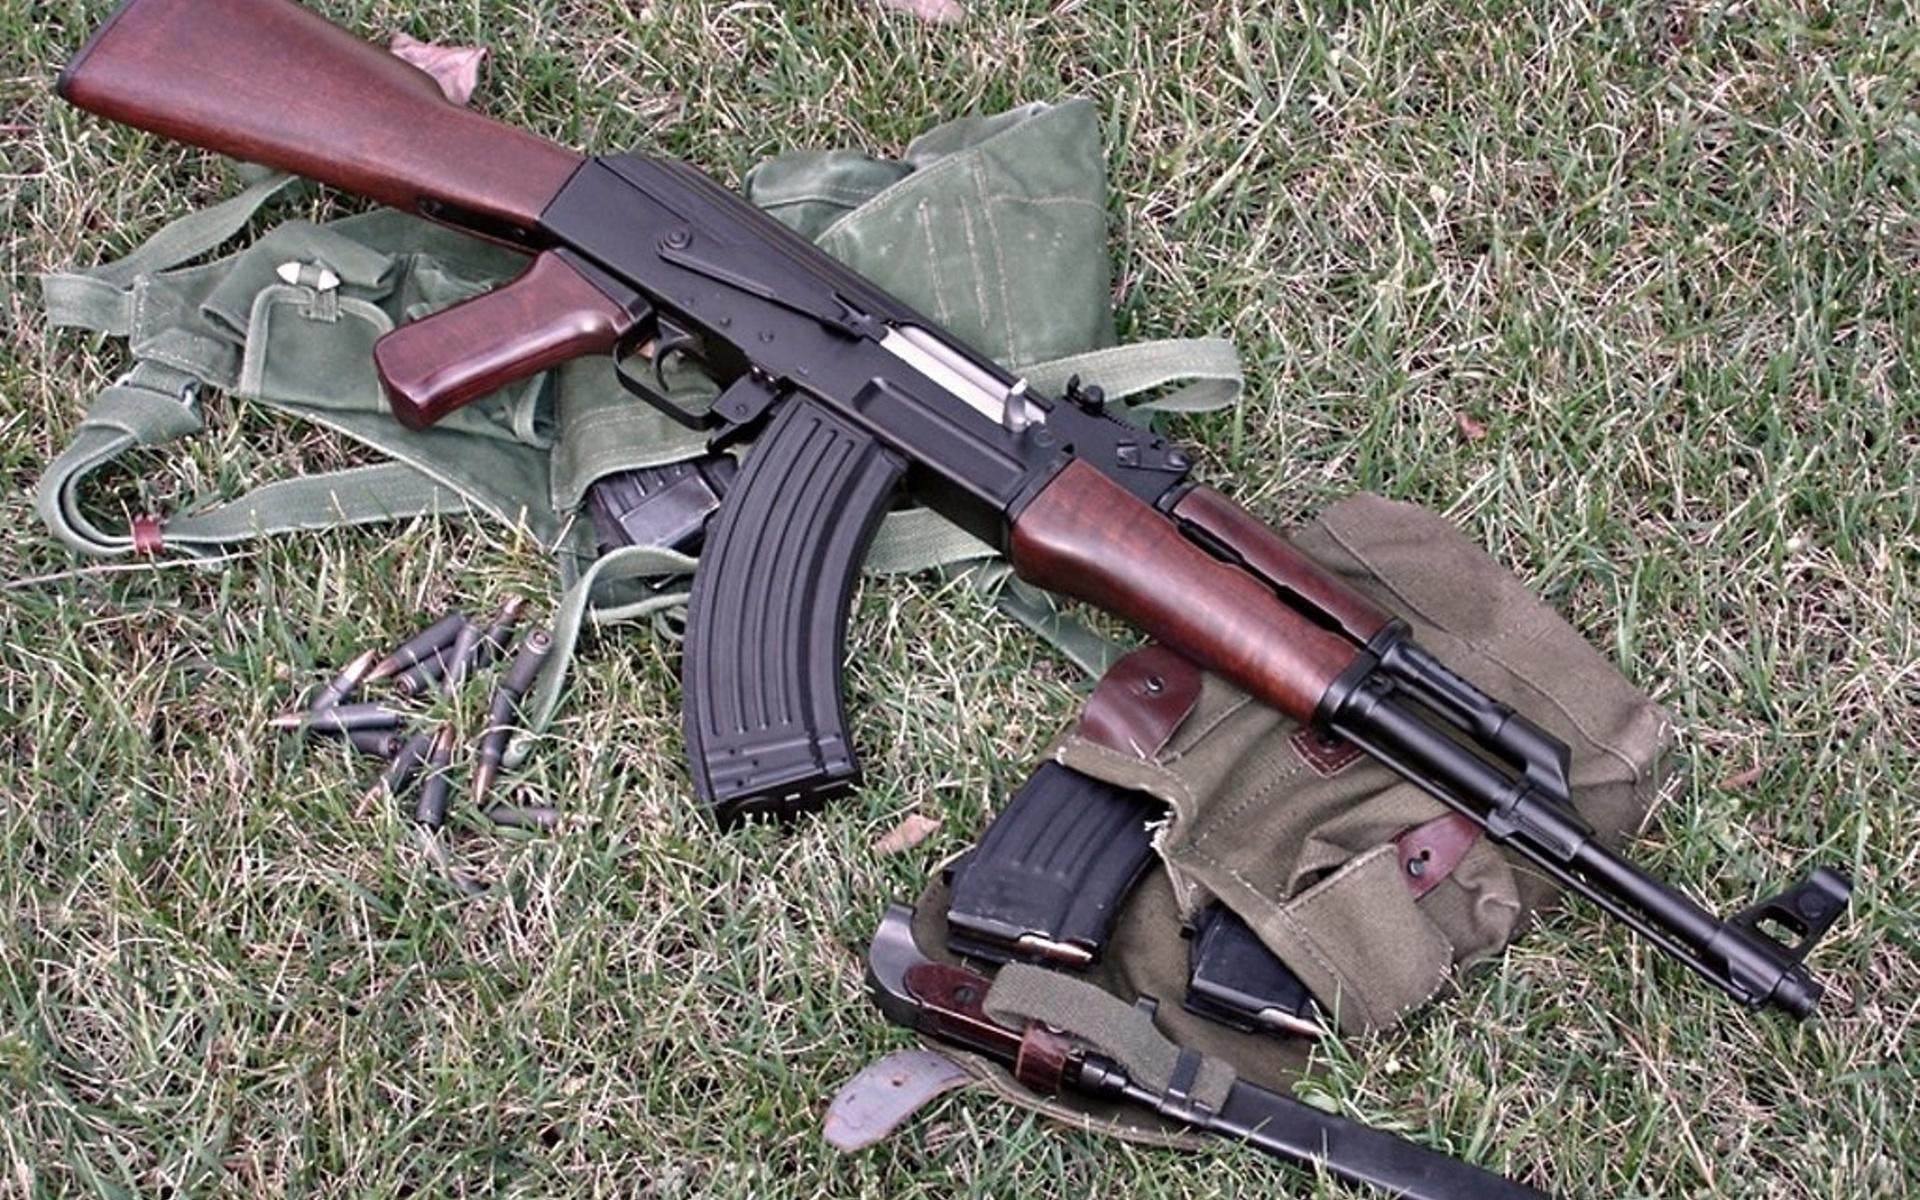 Akm Assault Rifle Full HD Wallpaper and Background Image ...